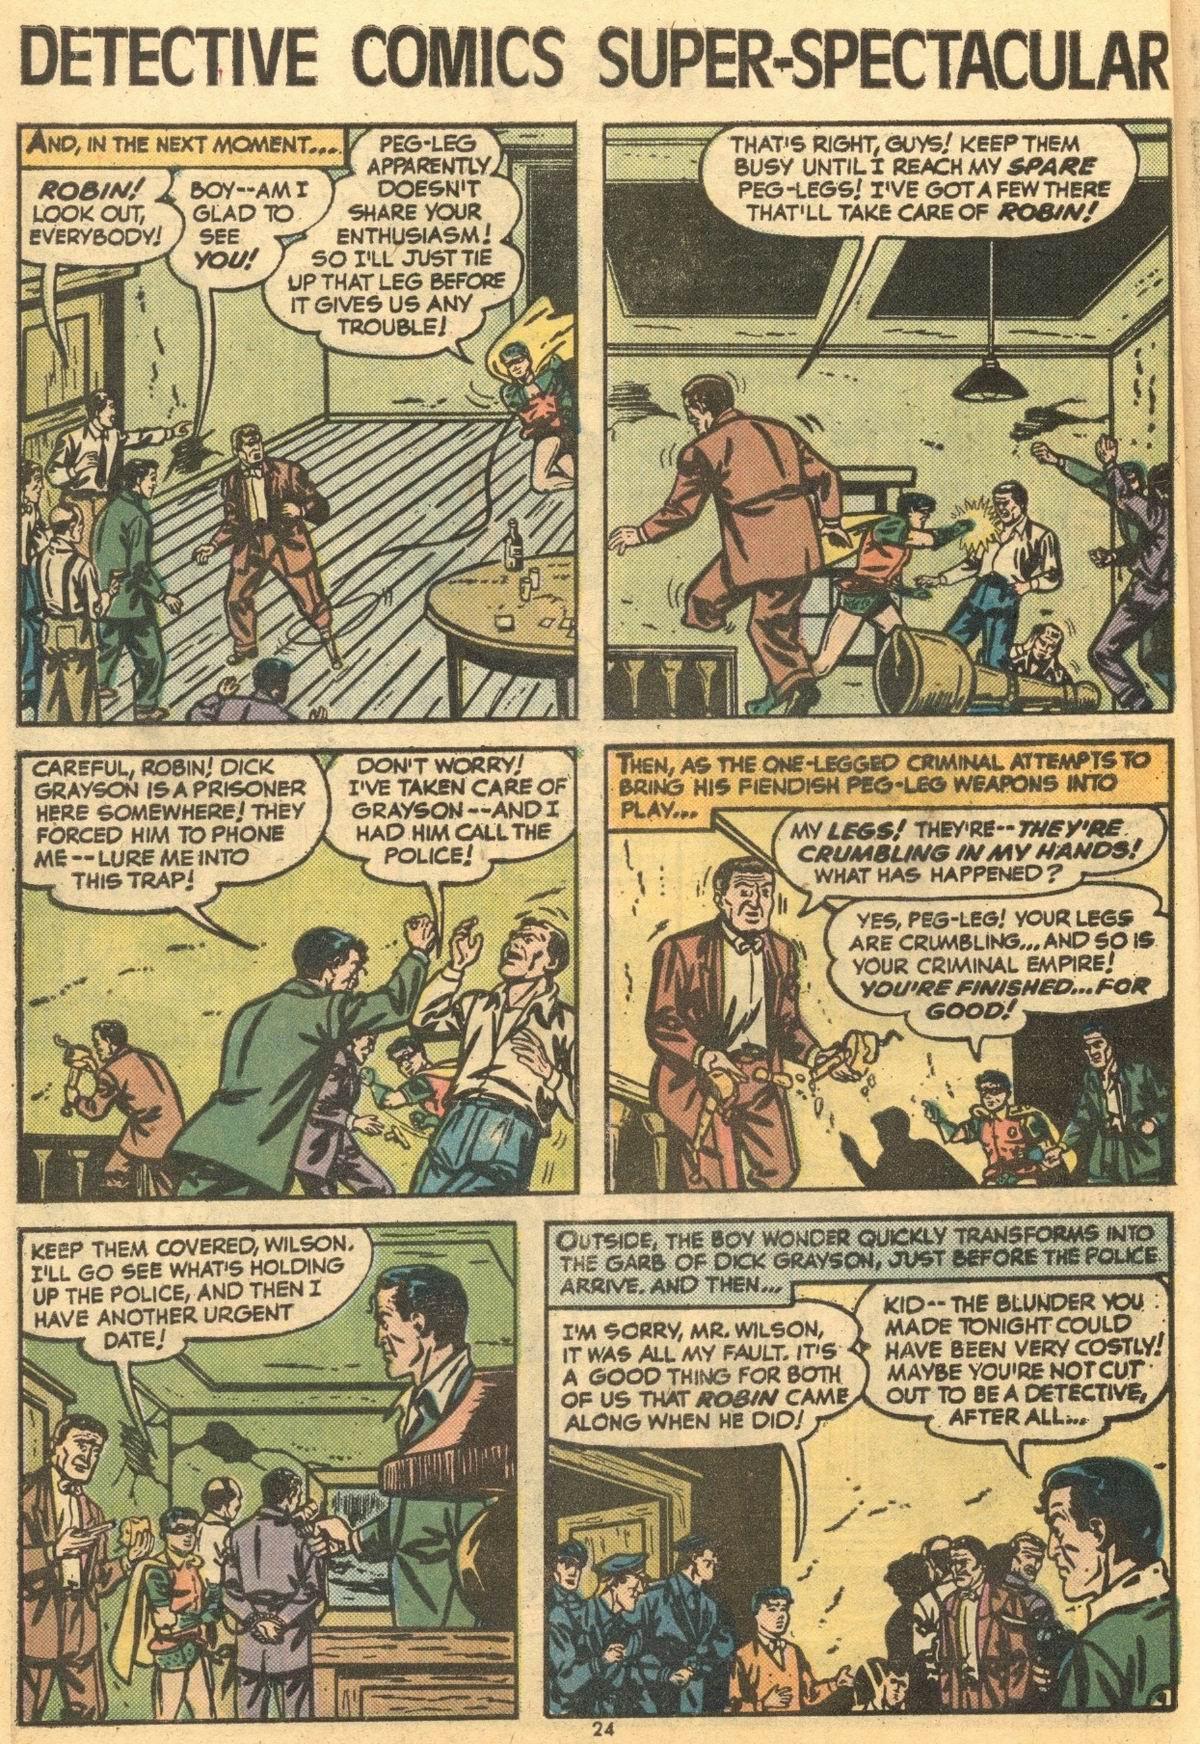 Detective Comics (1937) 444 Page 23